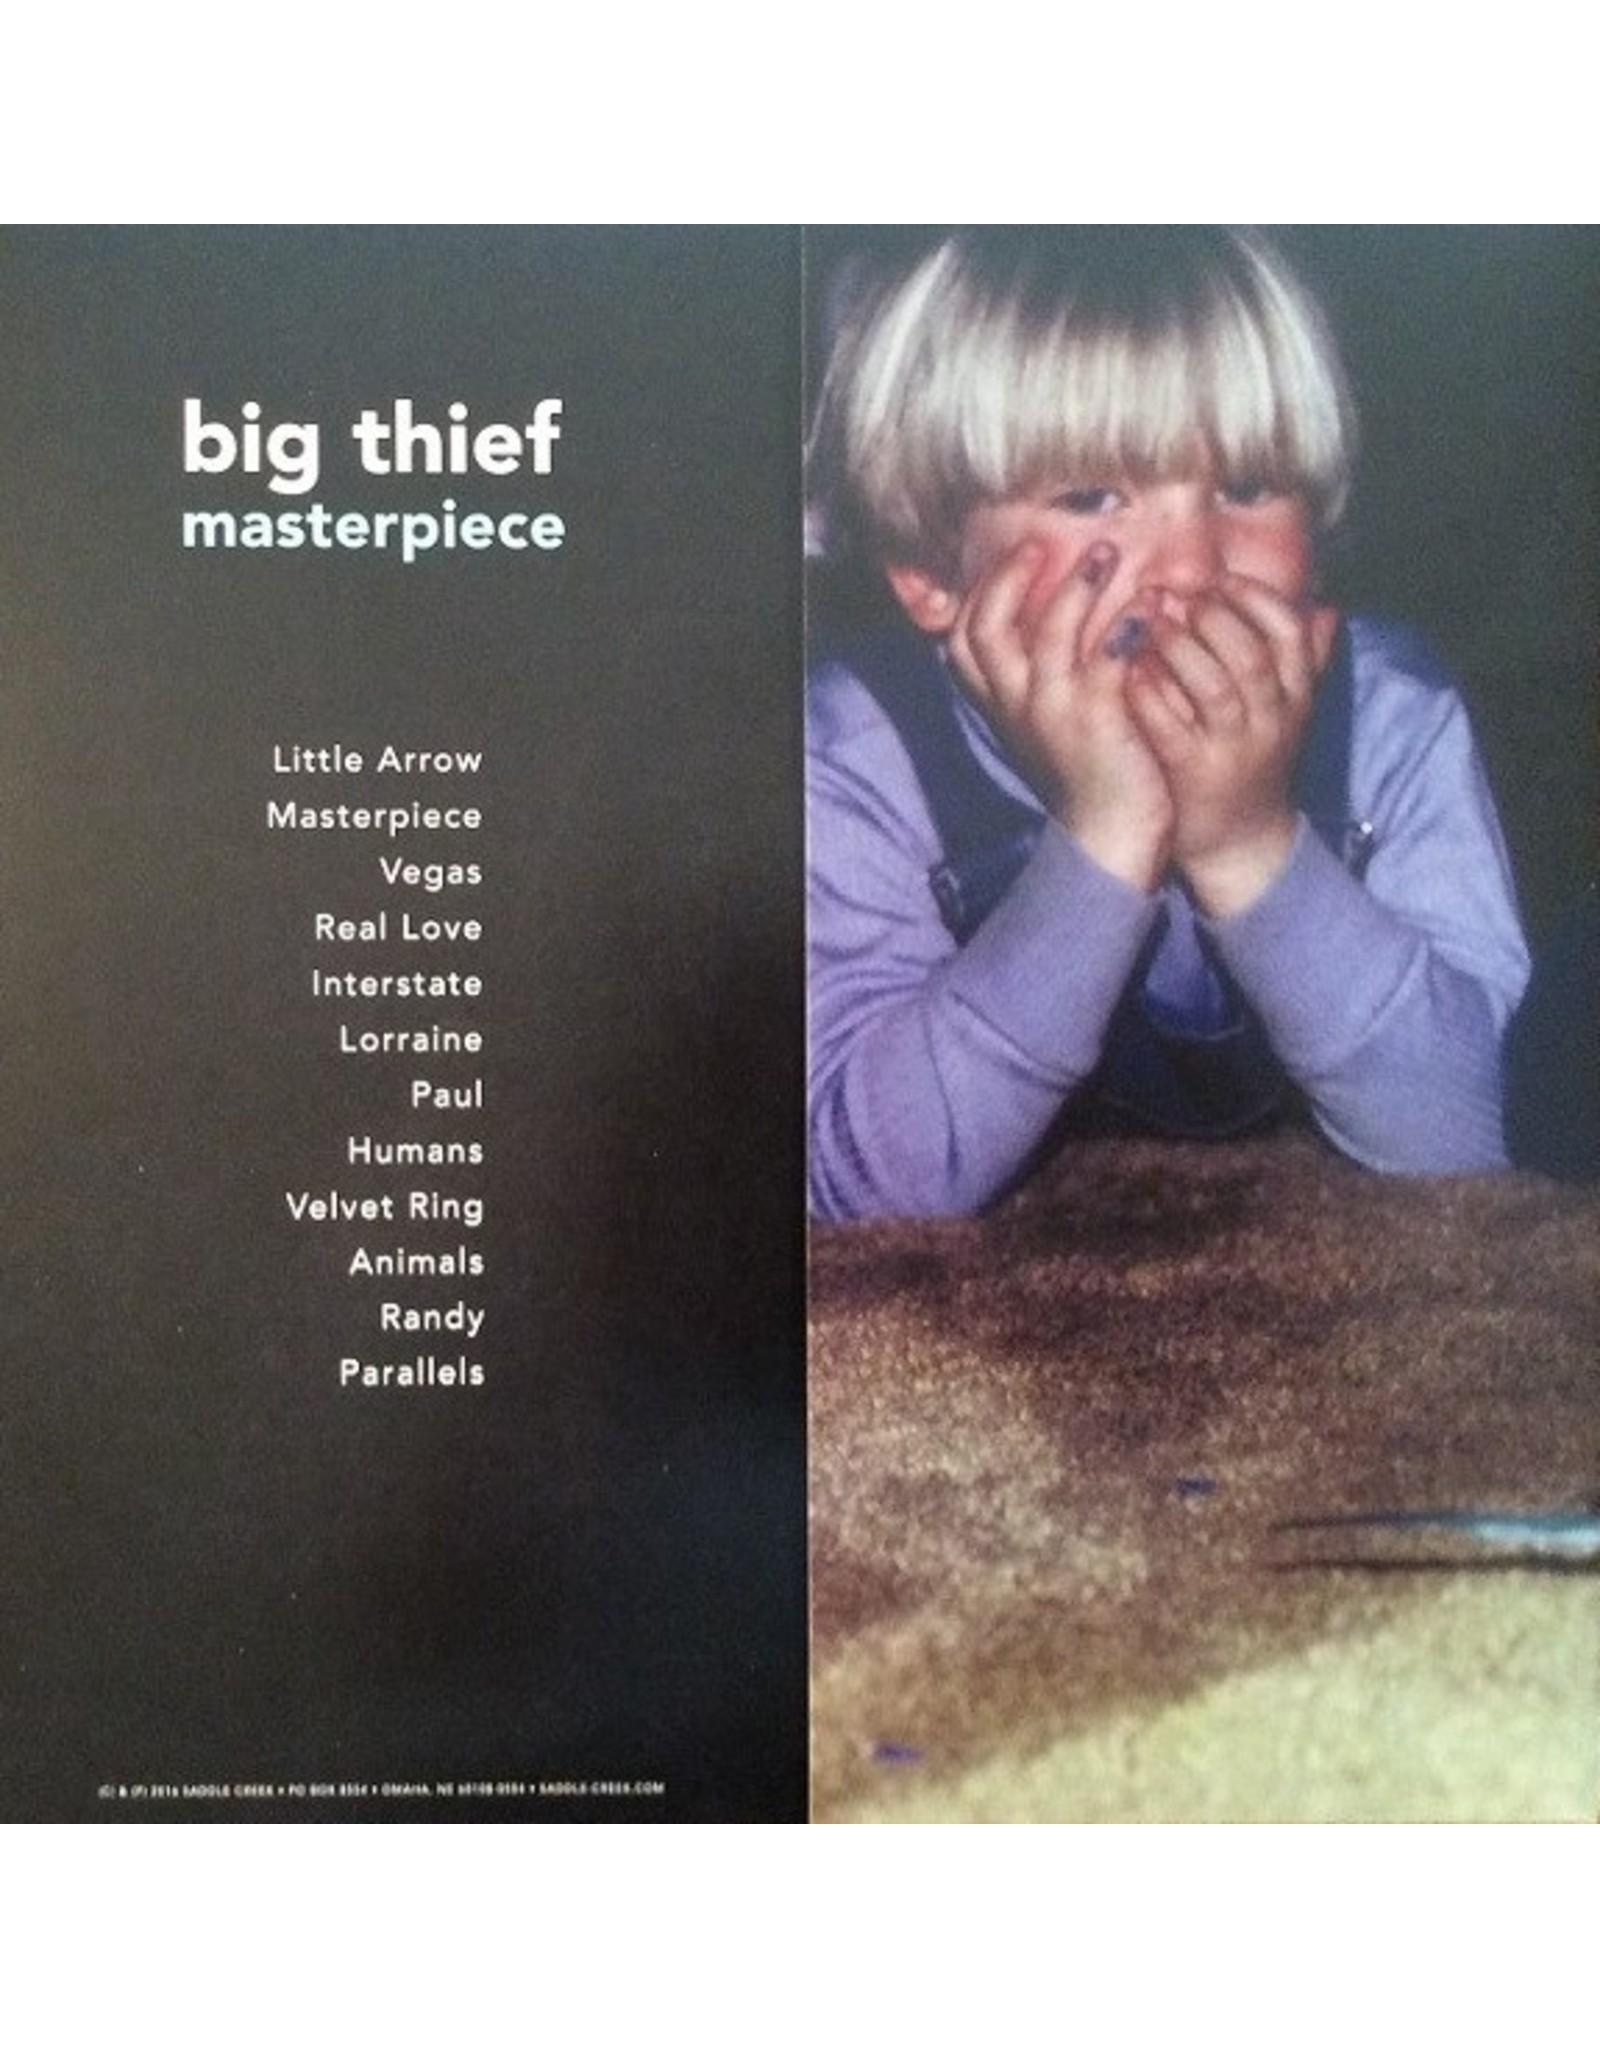 Big Thief - Masterpiece